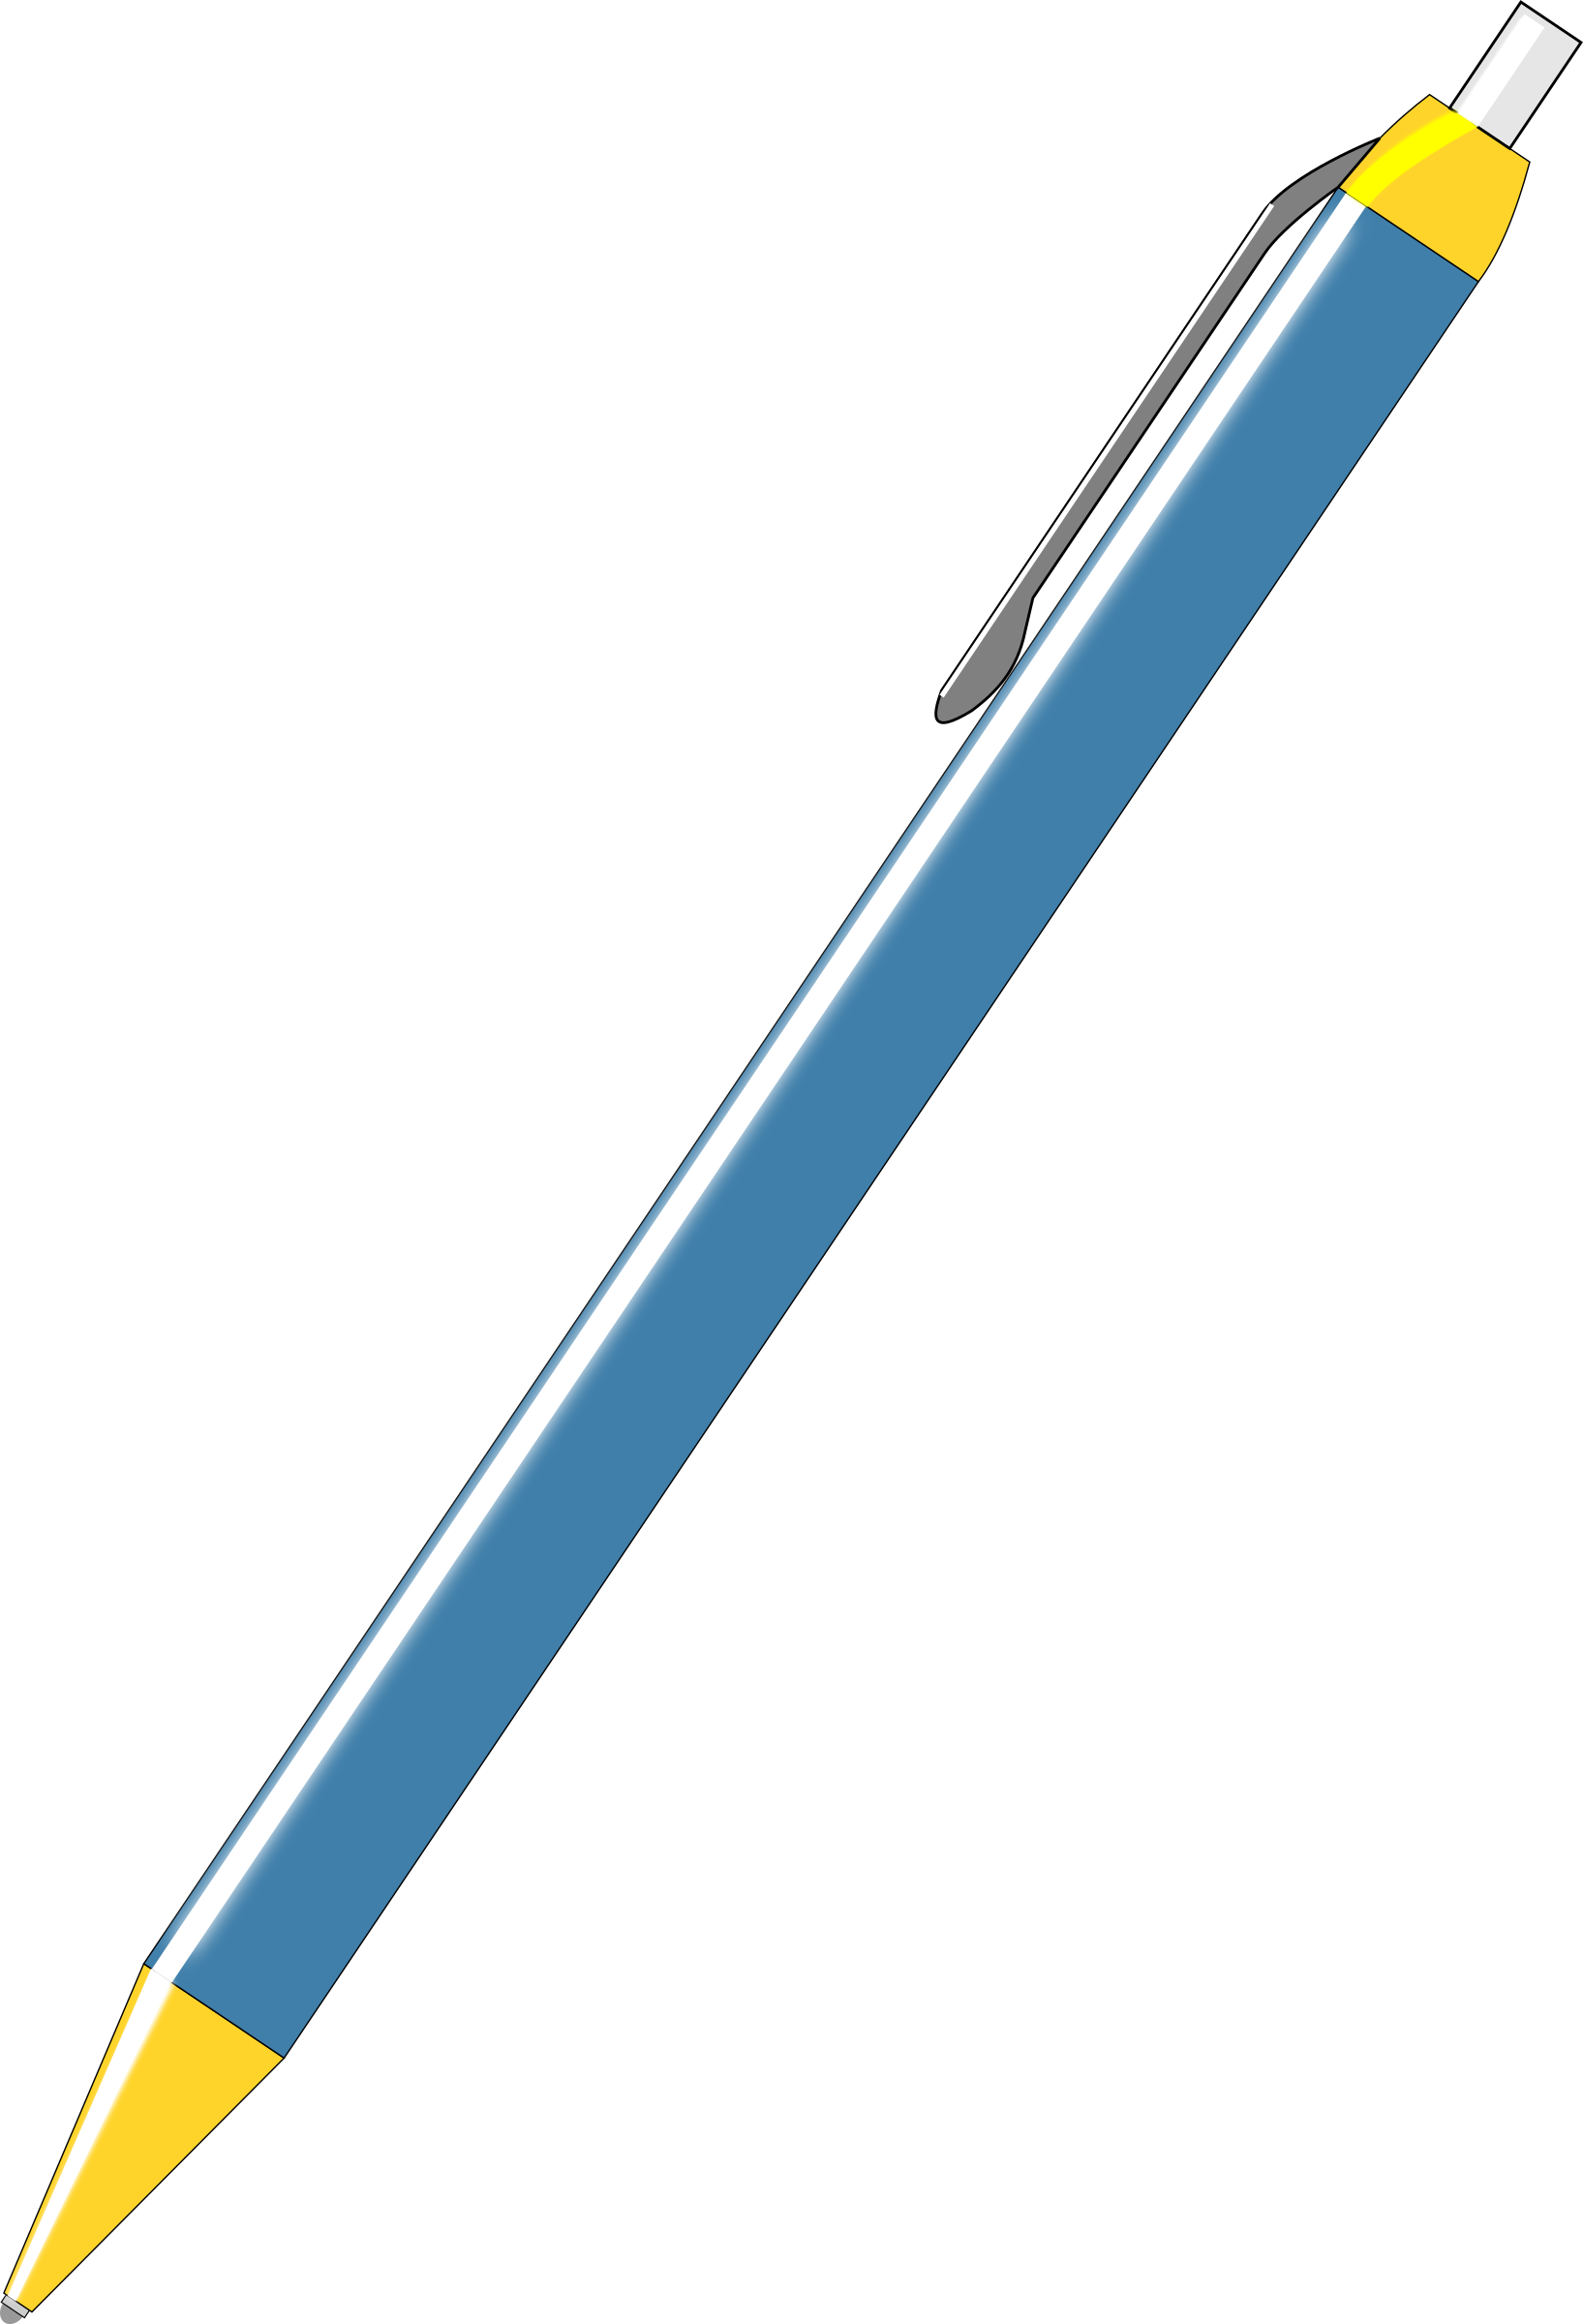 Pen clipart ballpoint pen Ballpoint Clipart Pen Pen Ballpoint